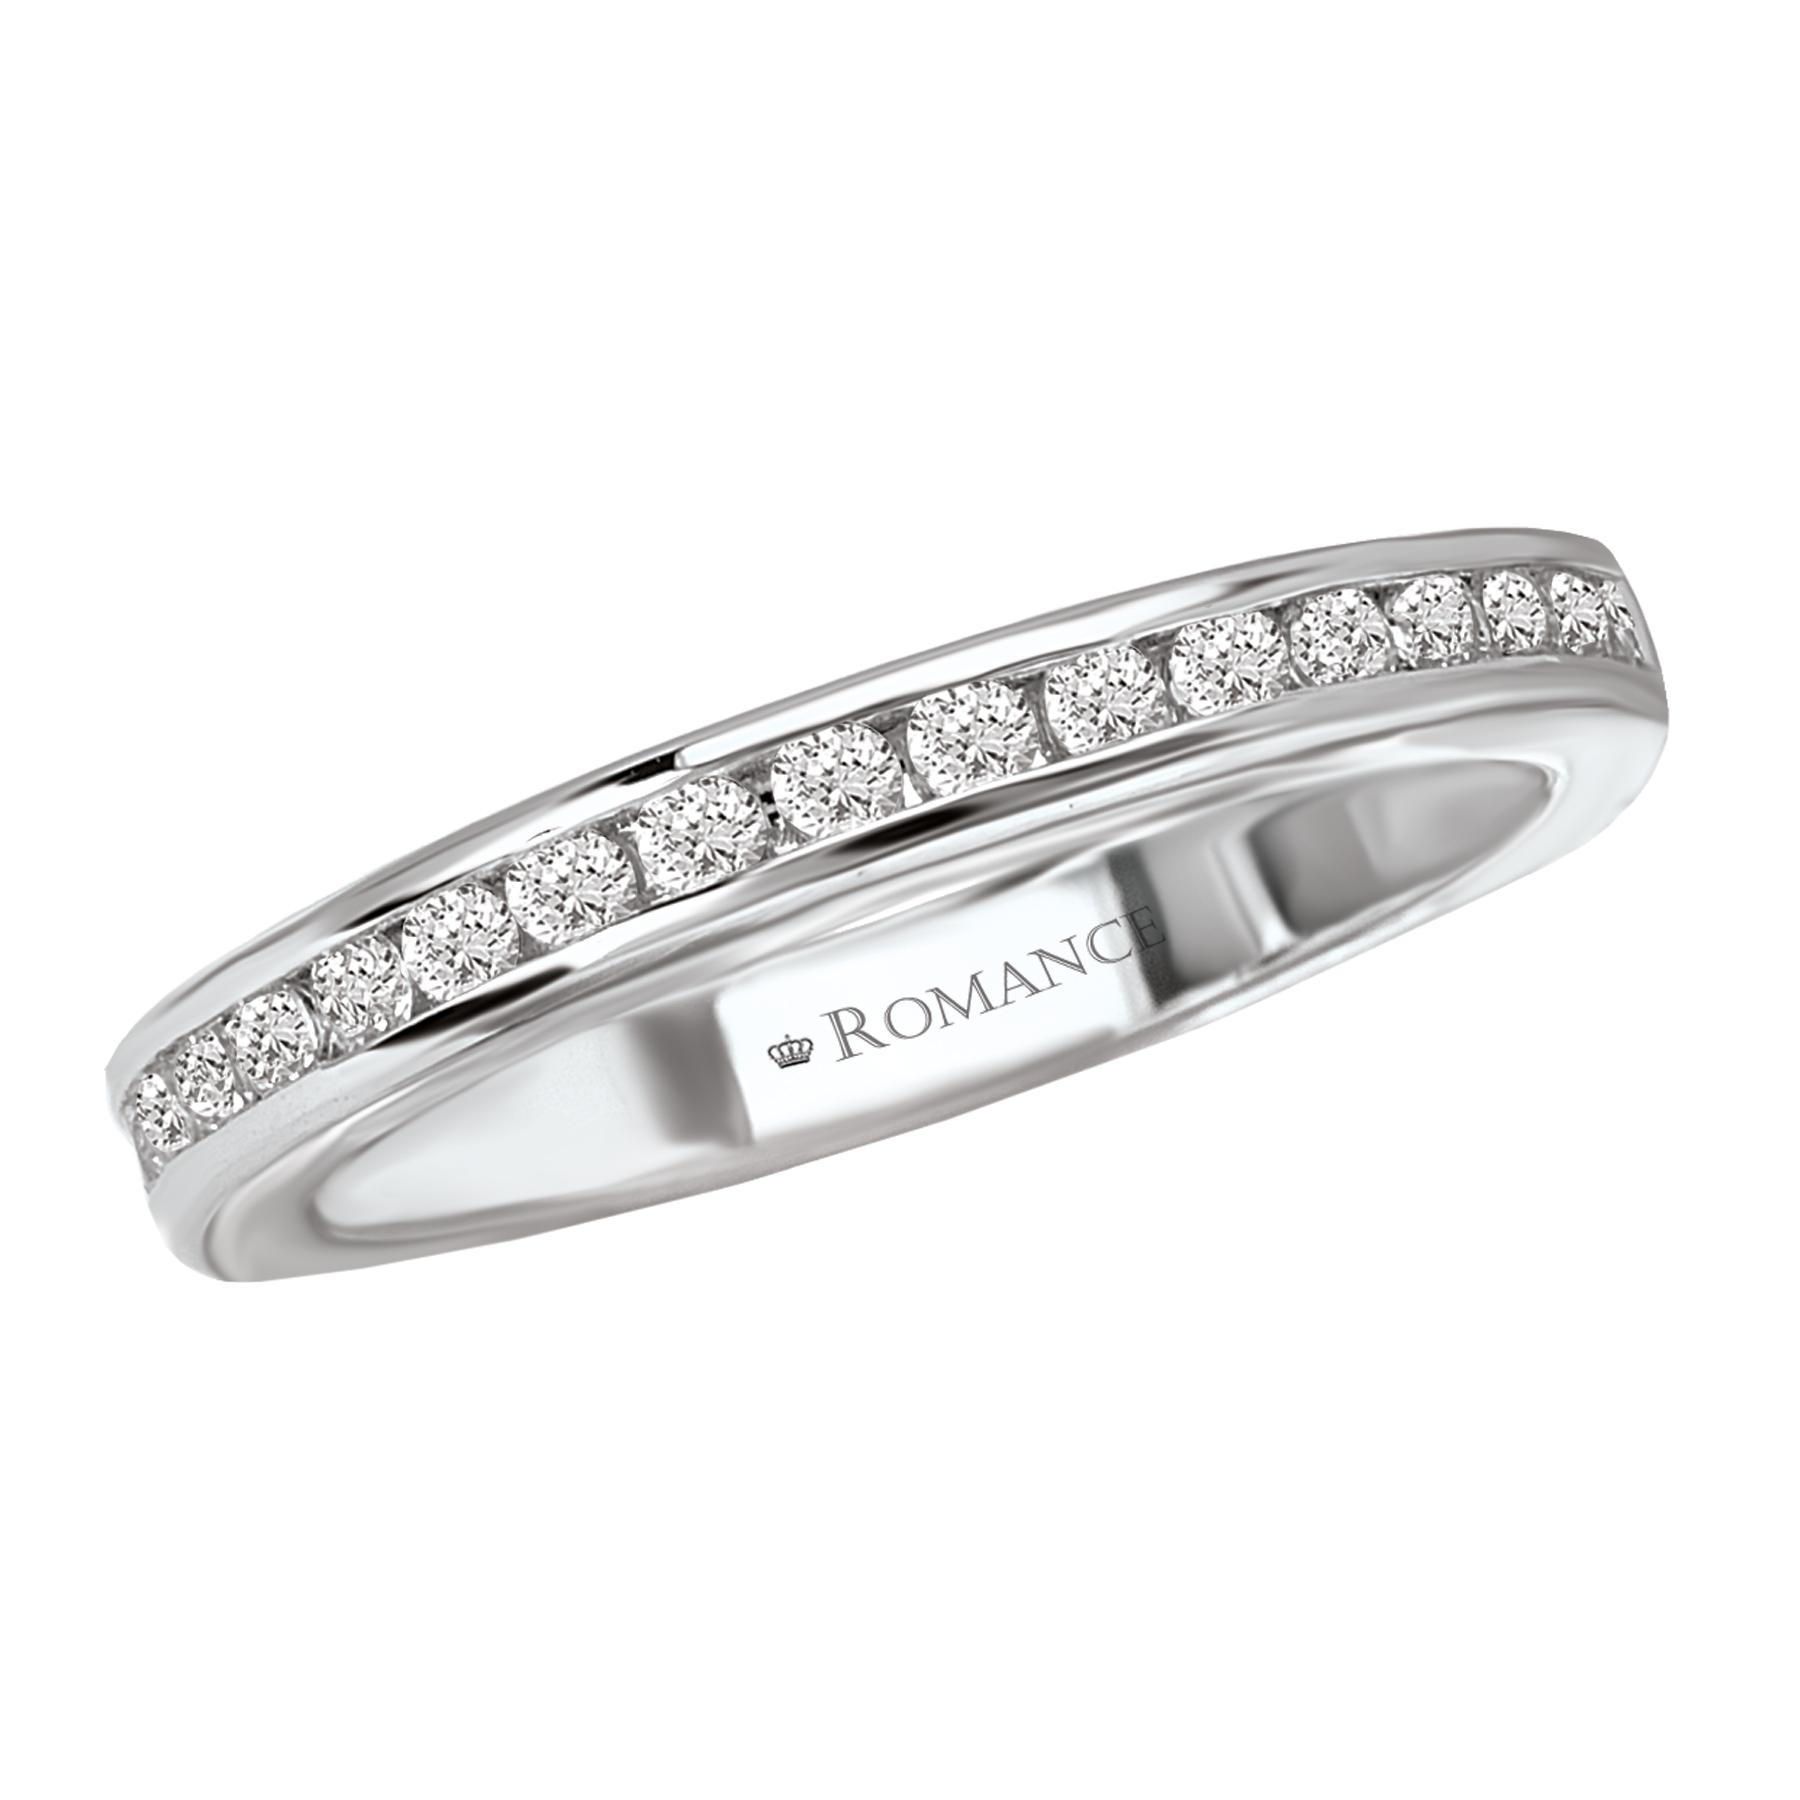 Romance Wedding Bands 117449-W product image